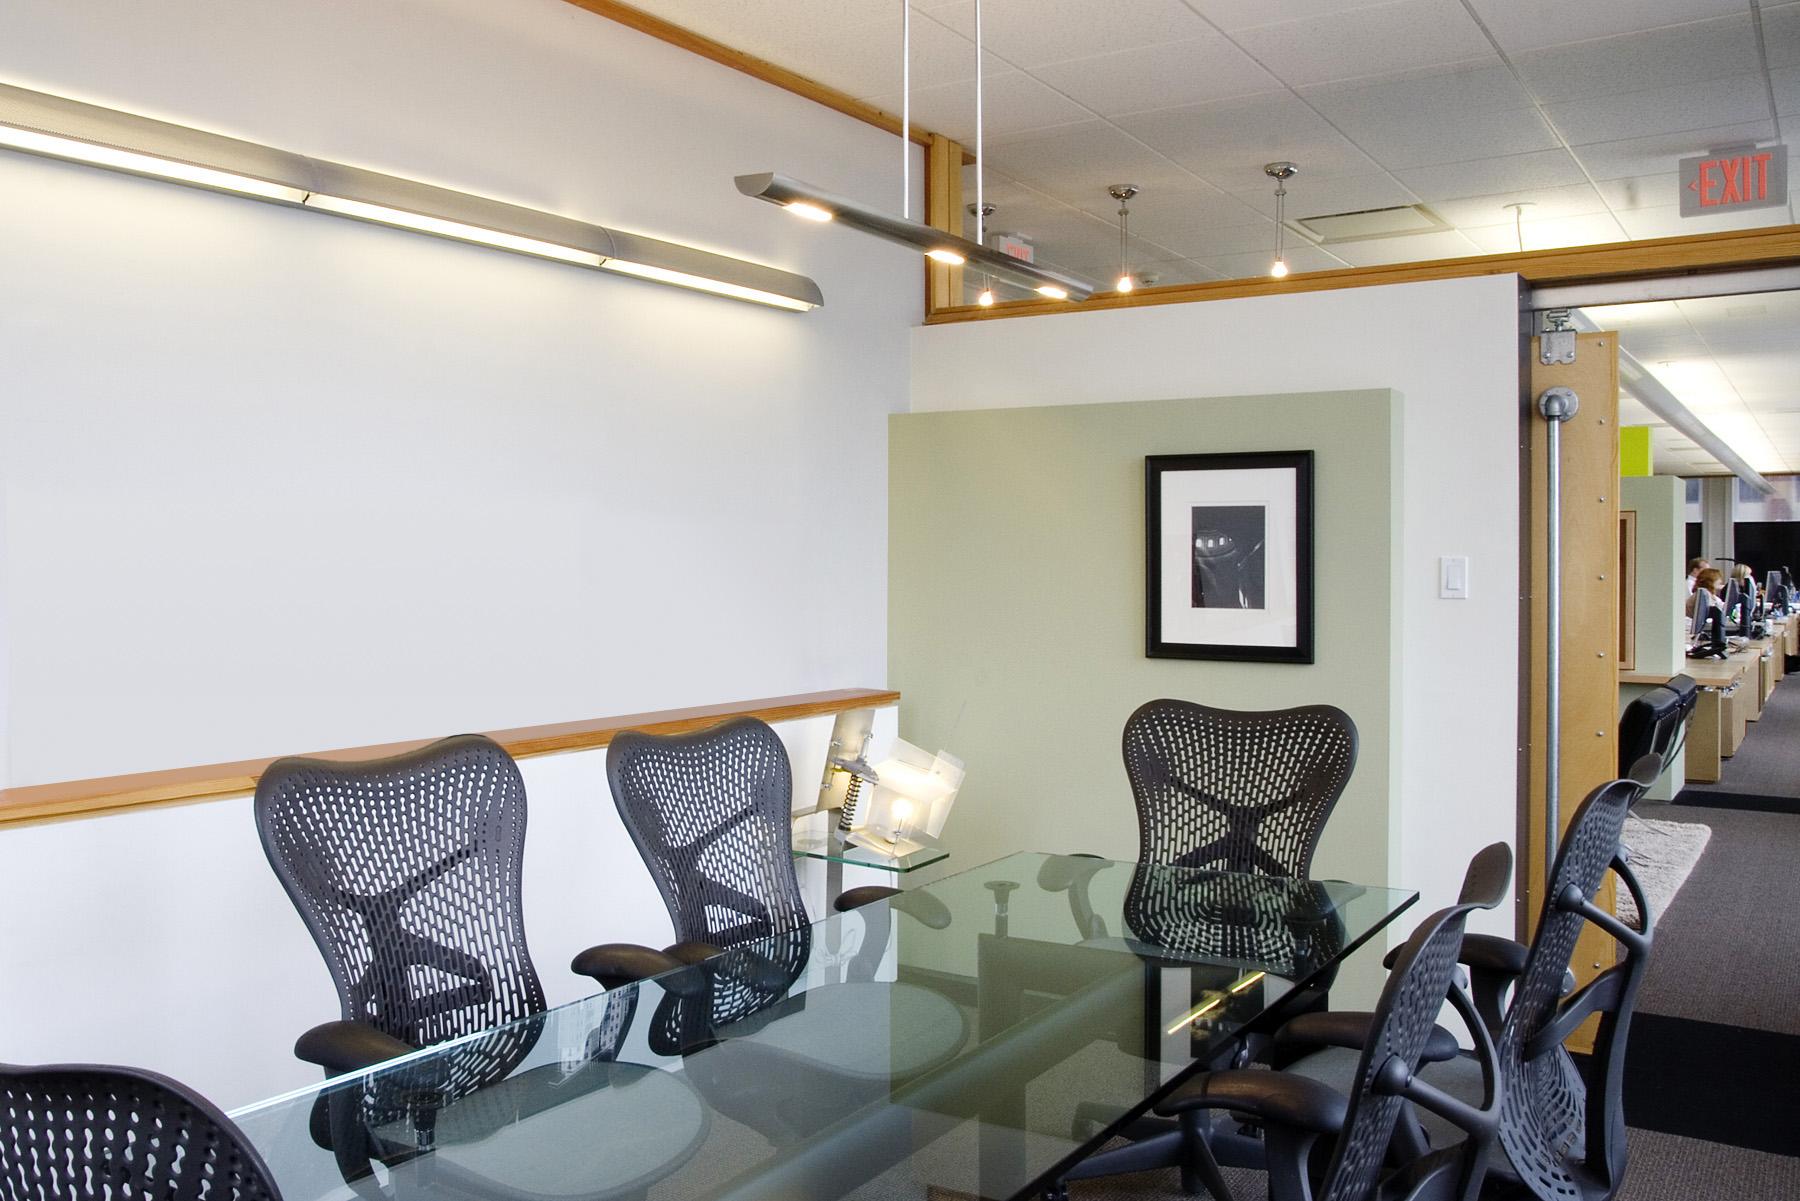 Urban Studio_Conference Room 02.jpg